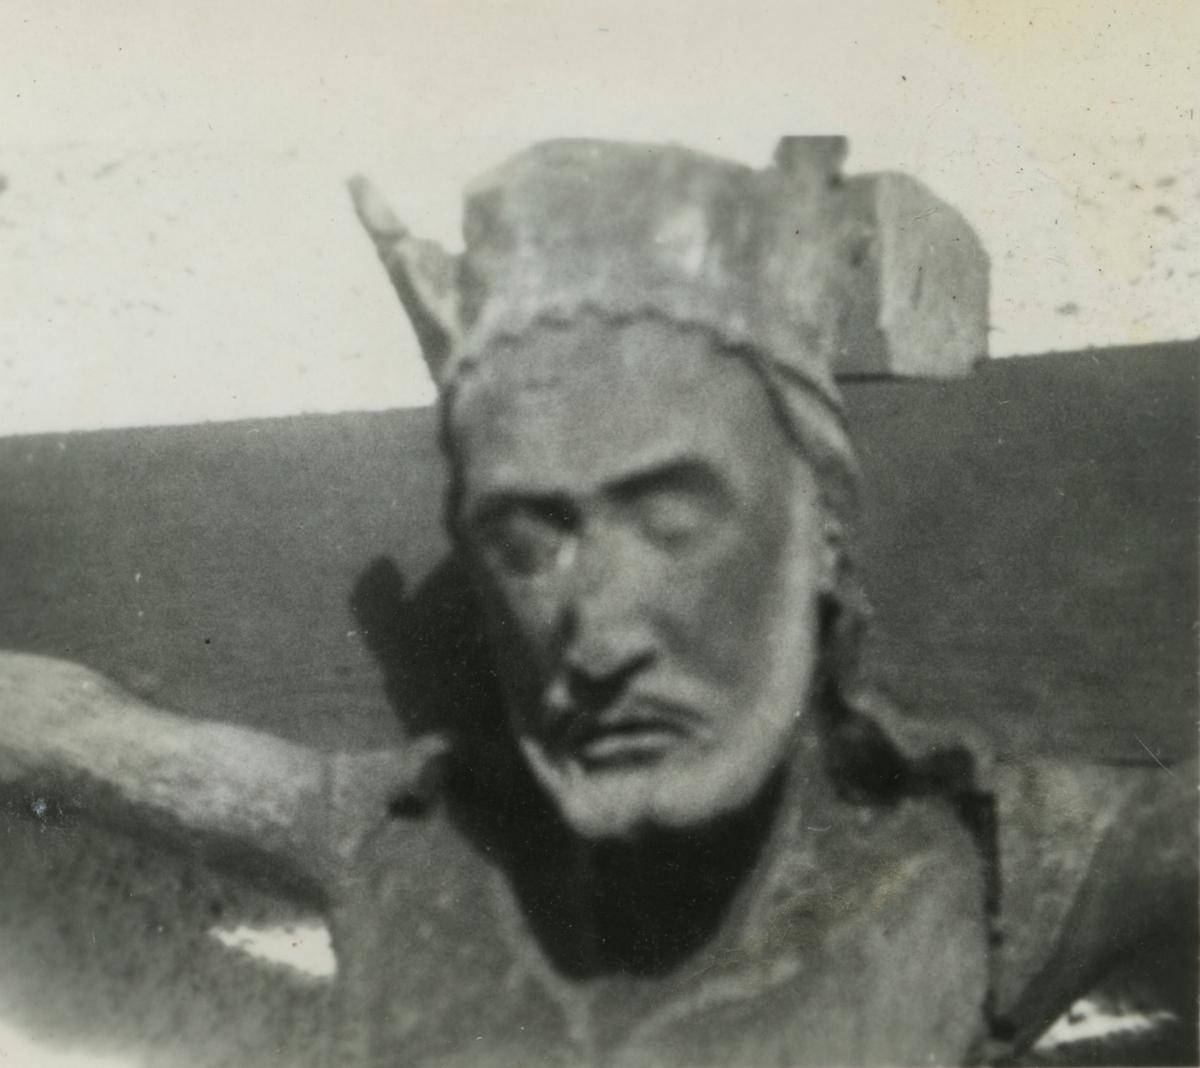 Triumfkrucifix från omkring 1250.